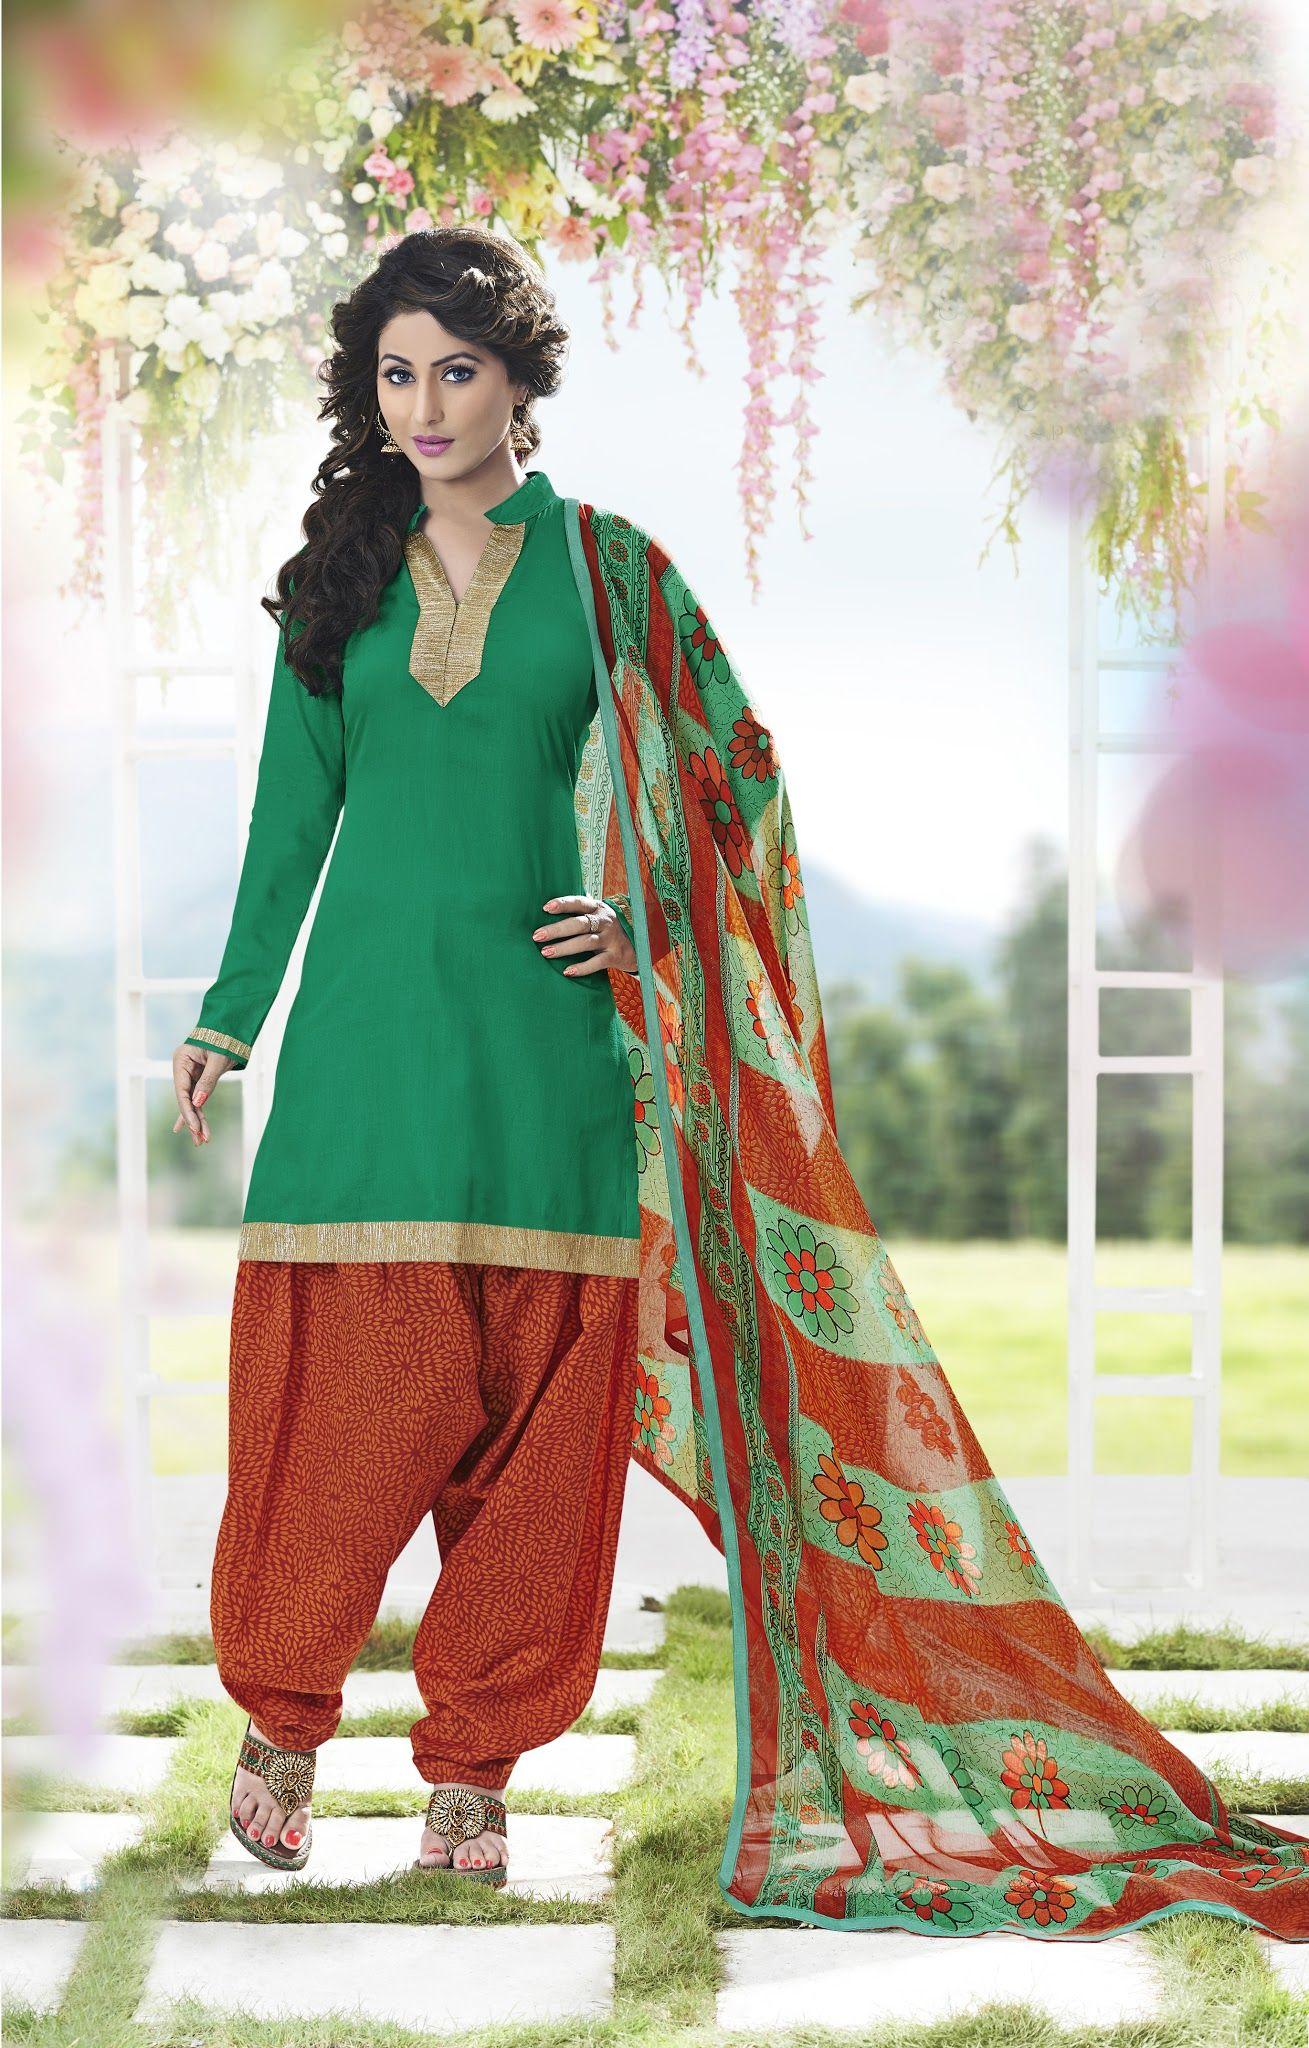 c34b9a35a5 Buy Gorgeous Green Patiala Salwar Kameez online at  https://www.a1designerwear.